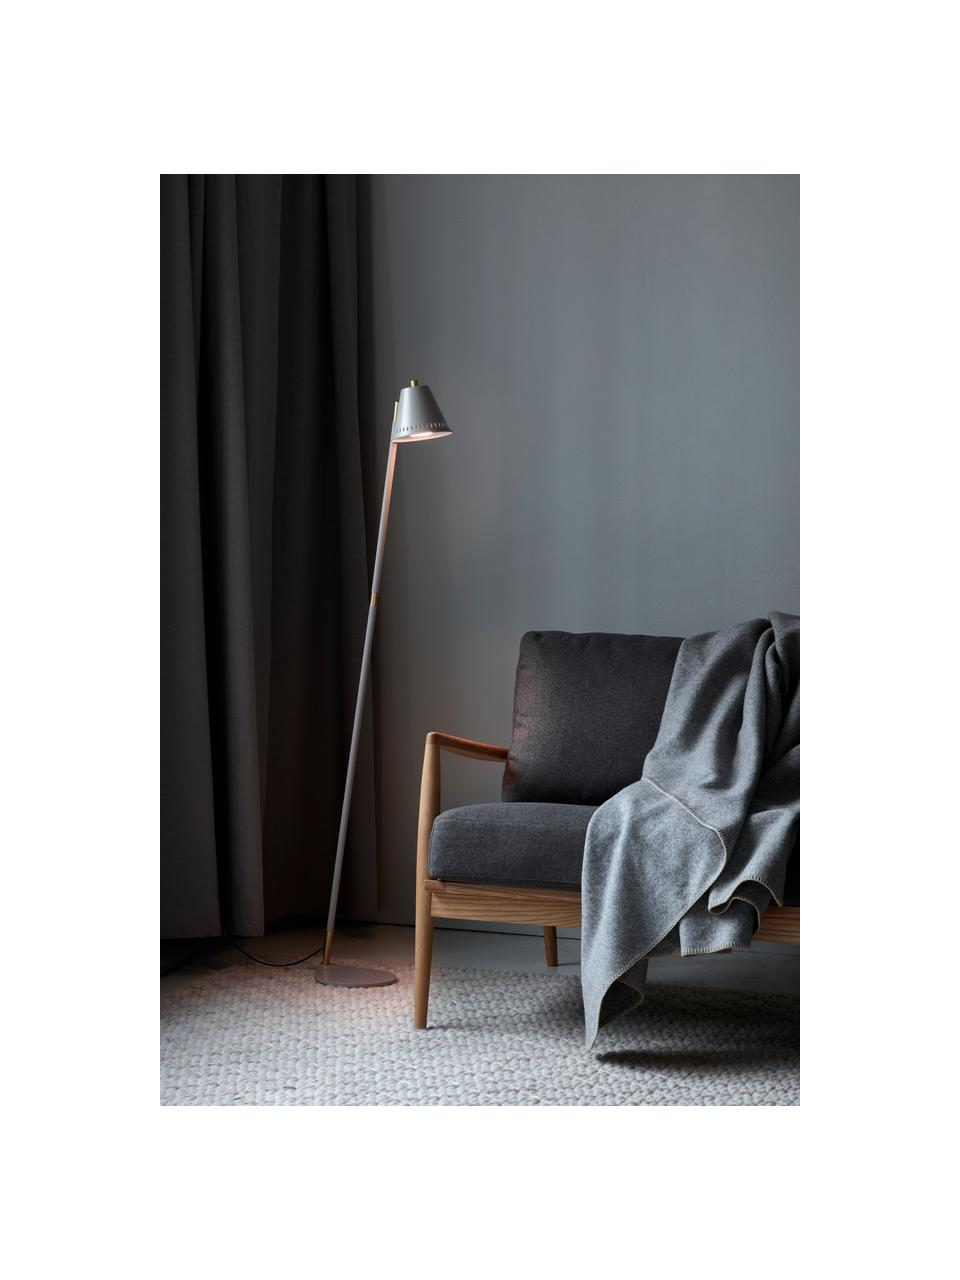 Kleine Retro-Leselampe Pine, Lampenschirm: Metall, beschichtet, Lampenfuß: Metall, beschichtet, Dekor: Metall, beschichtet, Grau, Messingfarben, 37 x 133 cm